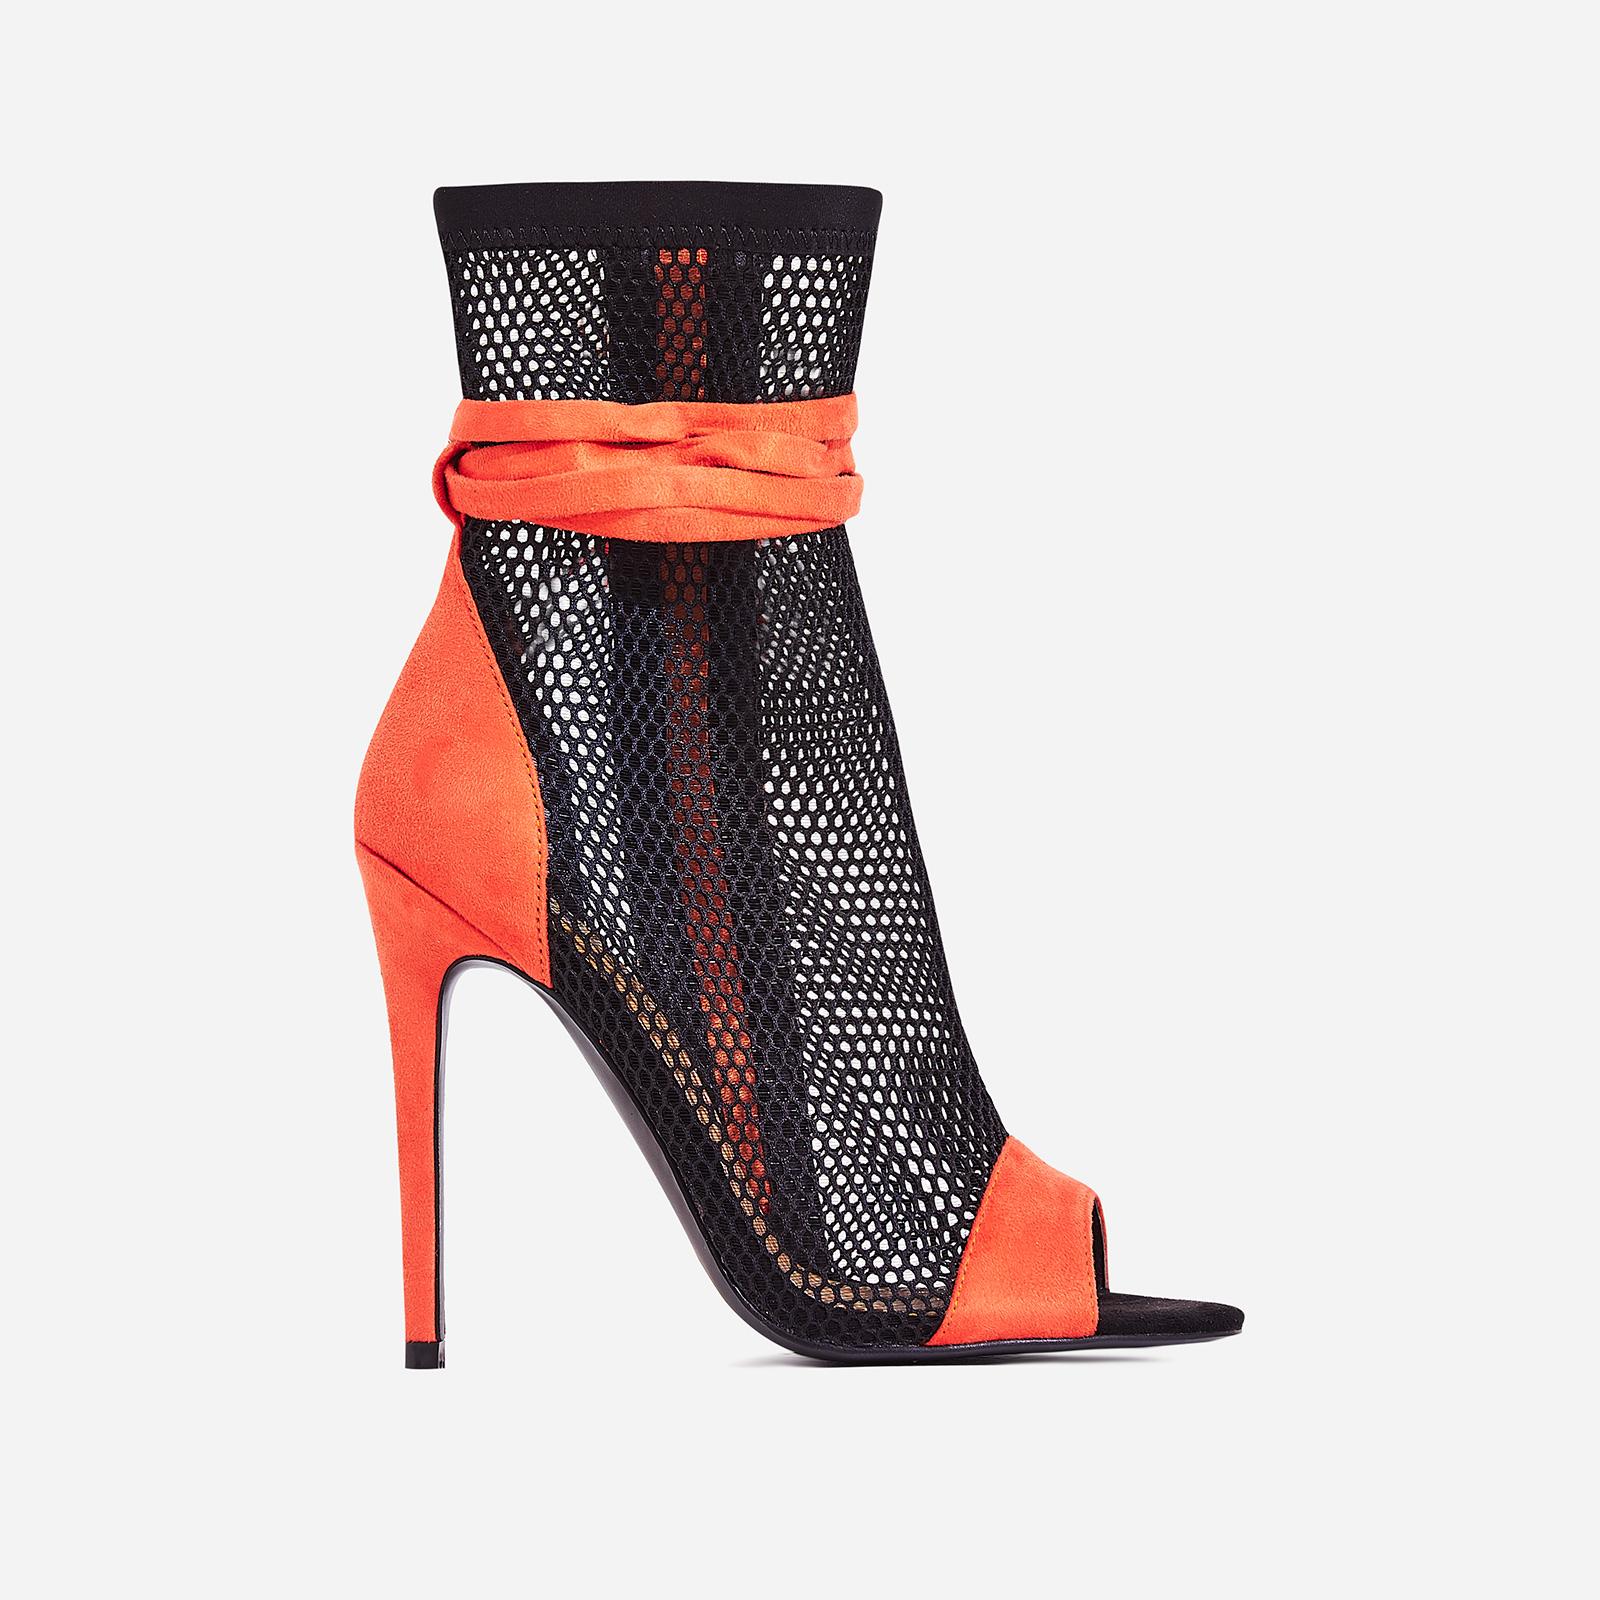 Jax Lace Up Mesh Peep Toe Heel In Orange Faux Suede